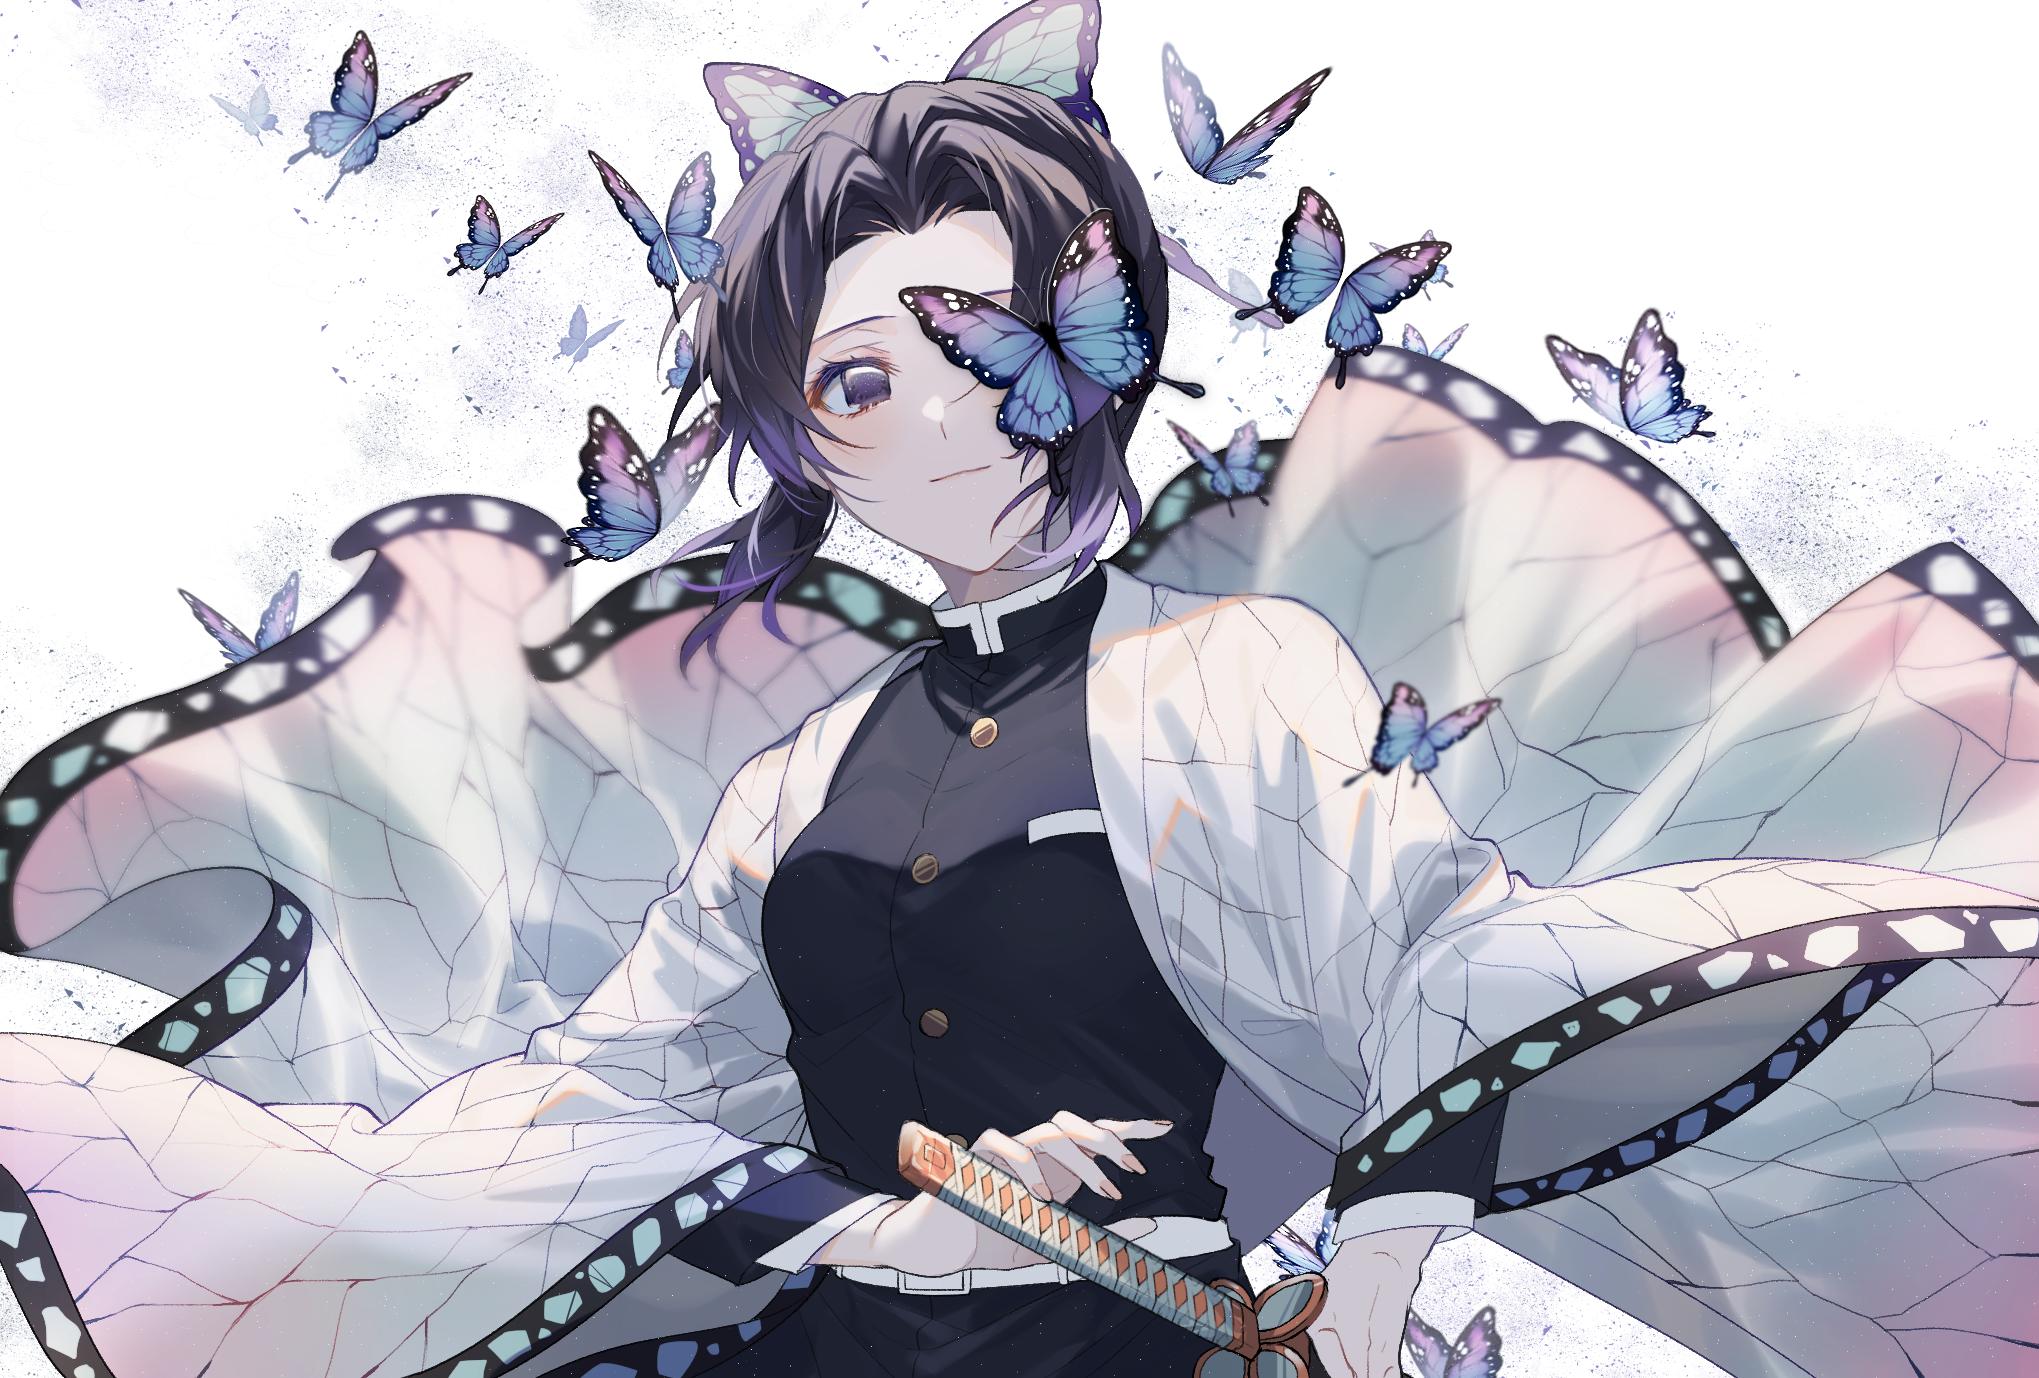 Shinobu Kochou HD Wallpaper   Background Image   2039x1378   ID:1058036 - Wallpaper Abyss